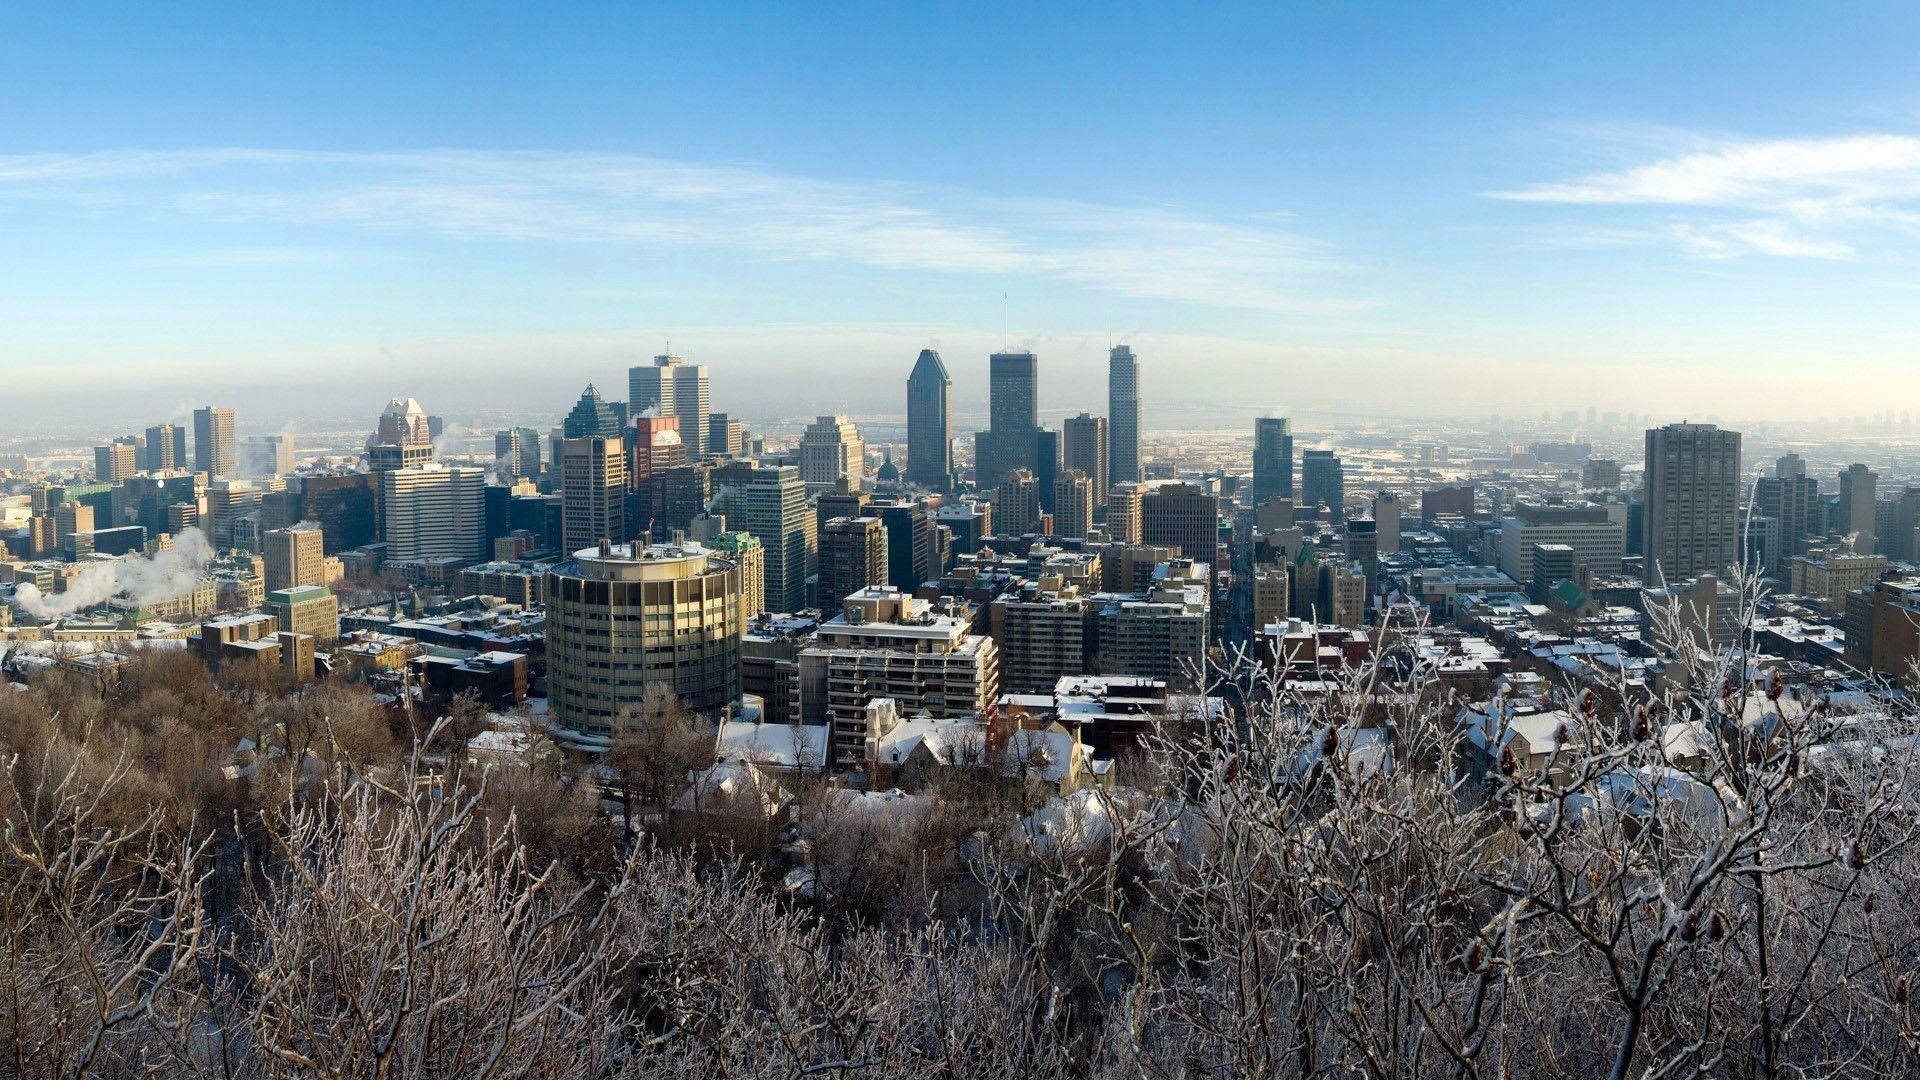 Montreal City Skyline wallpaper